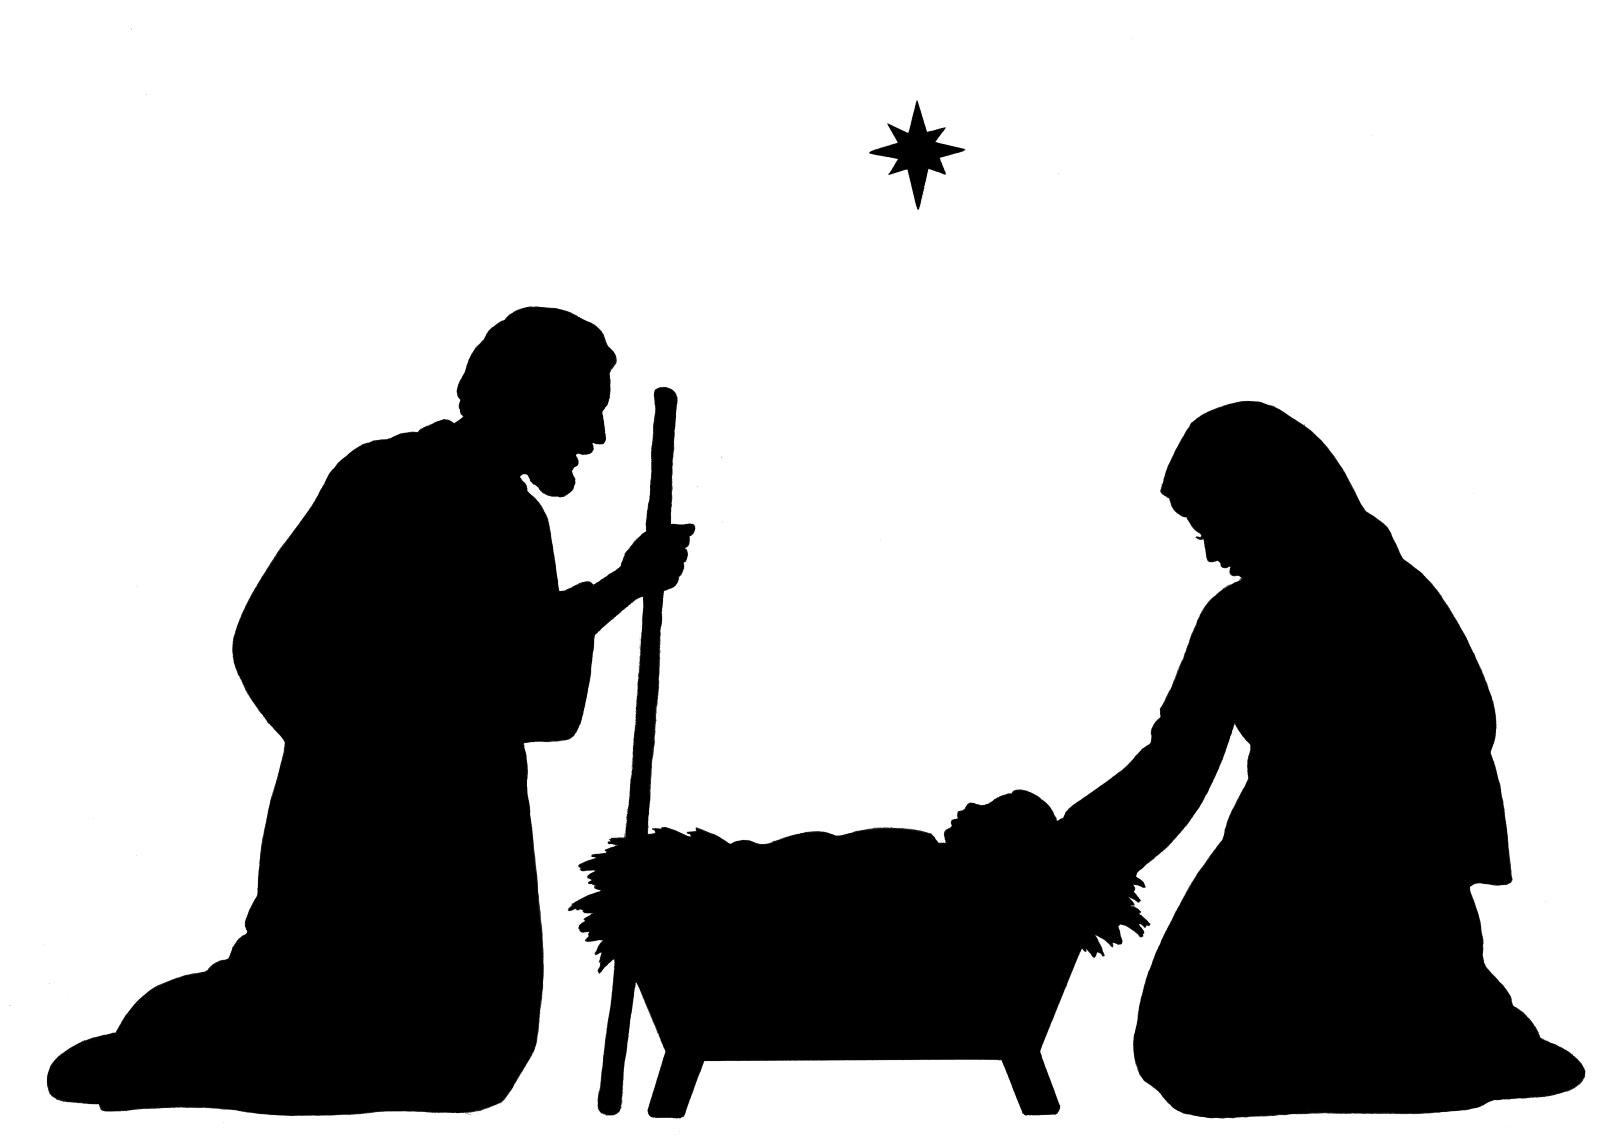 Nativity Silhouette Clip Art New Calenda-Nativity Silhouette Clip Art New Calendar Template Site-13